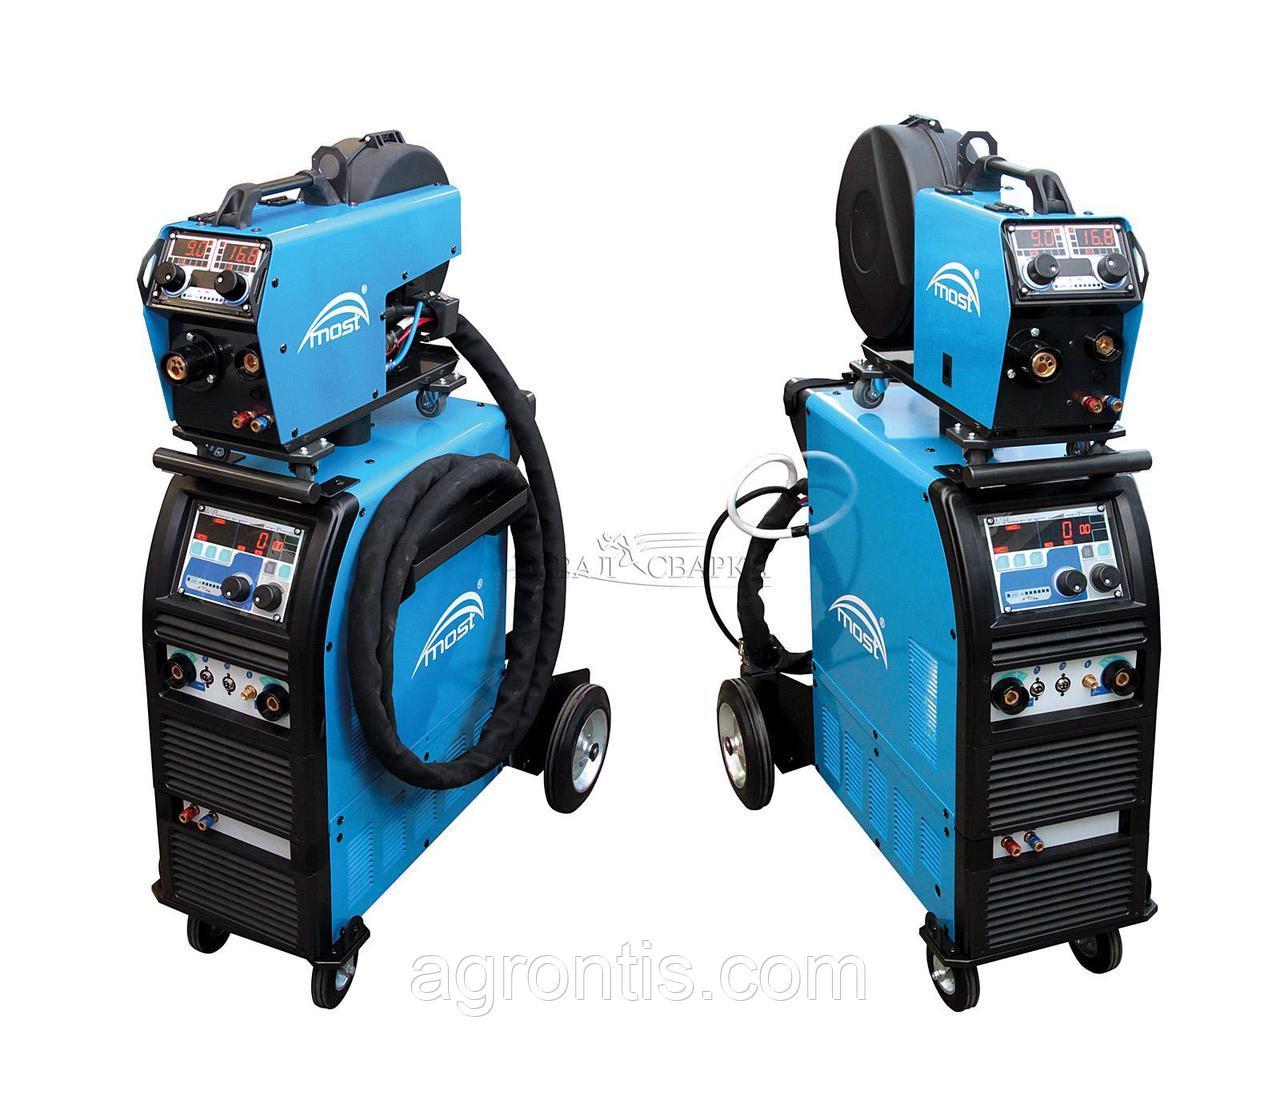 Полуавтомат FANMIG 500i VRD   MIG/MAG/Pulse/TIG/MMA инвертор